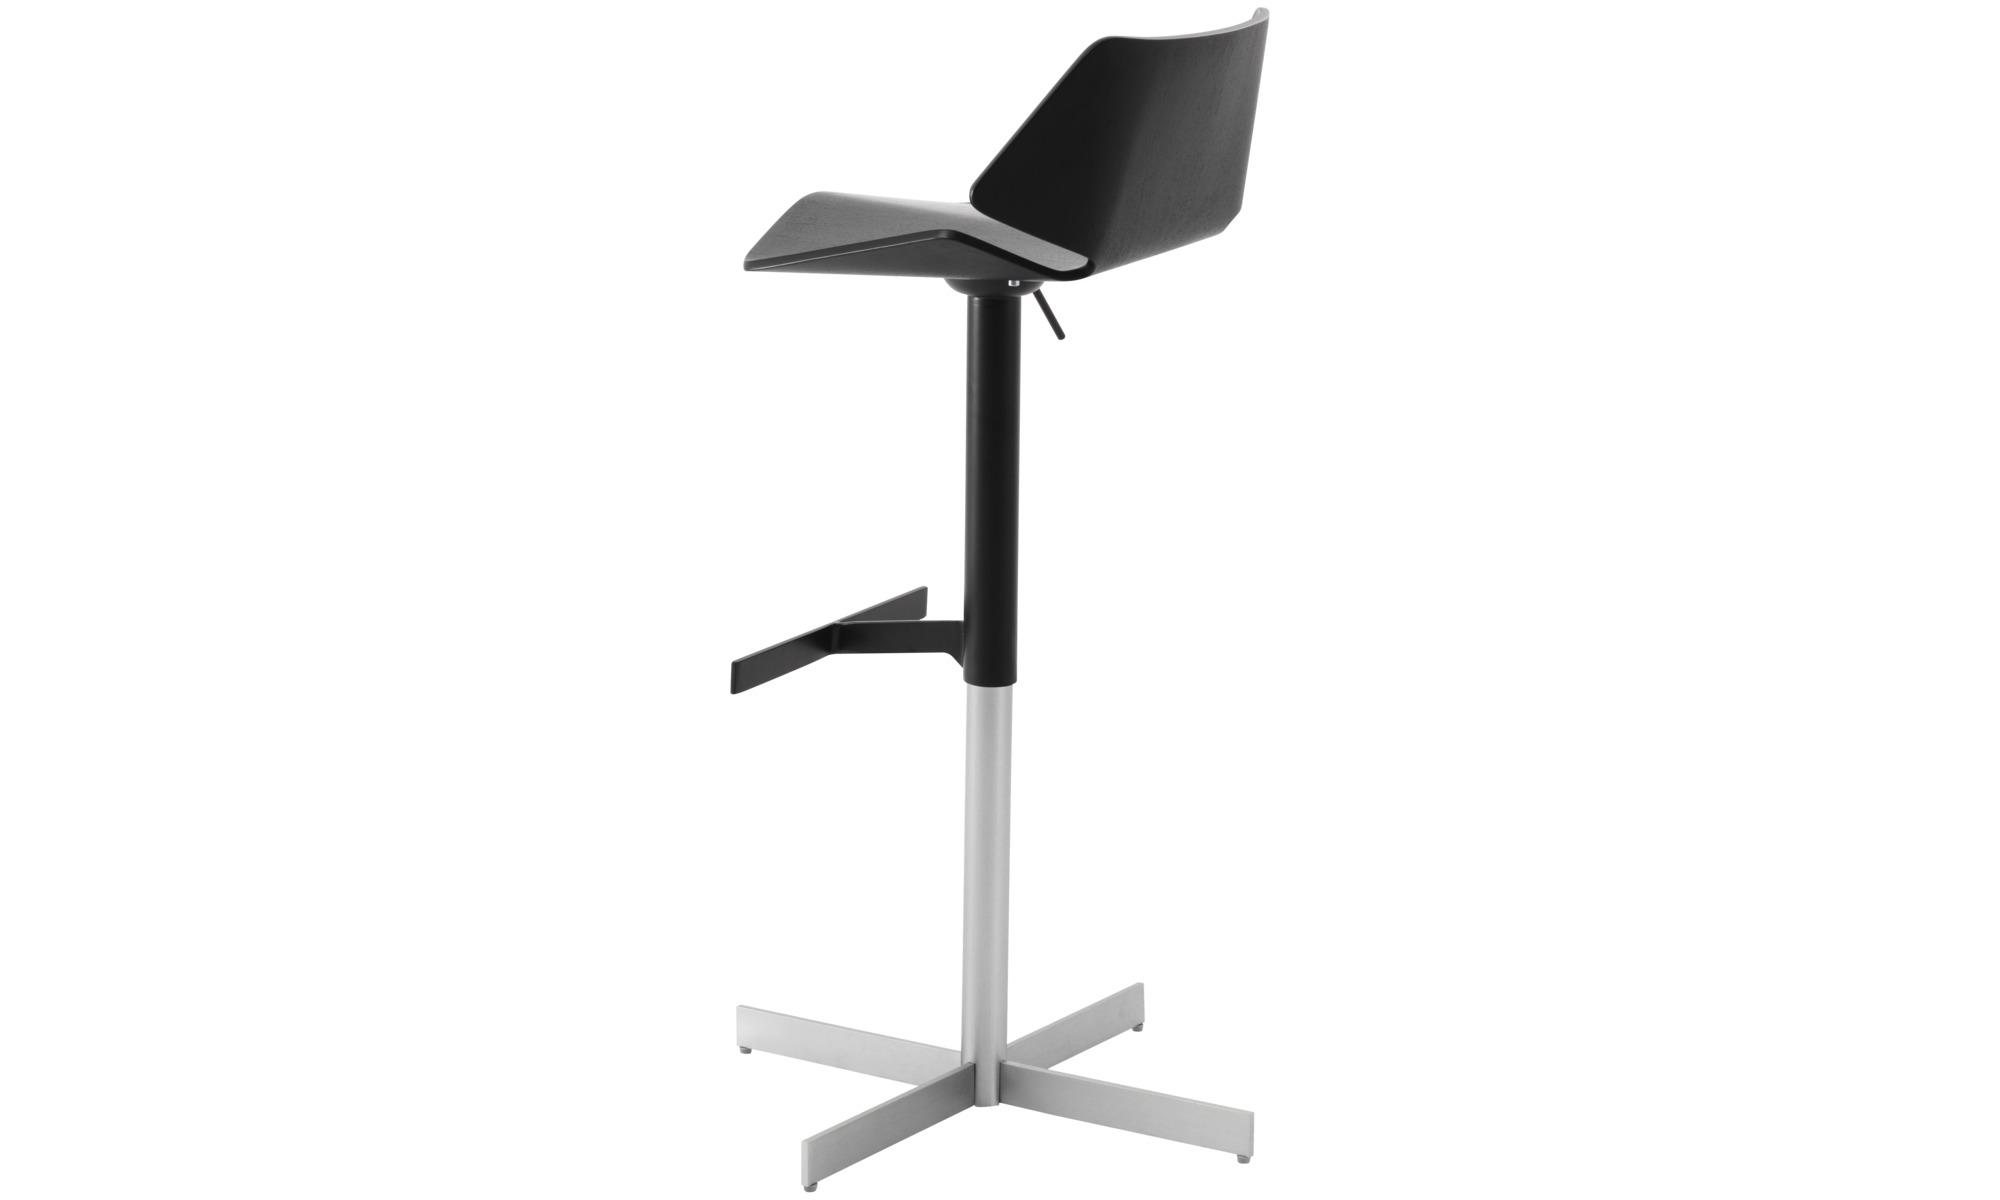 bar stools tokyo barstool with gas cartridge boconcept. Black Bedroom Furniture Sets. Home Design Ideas